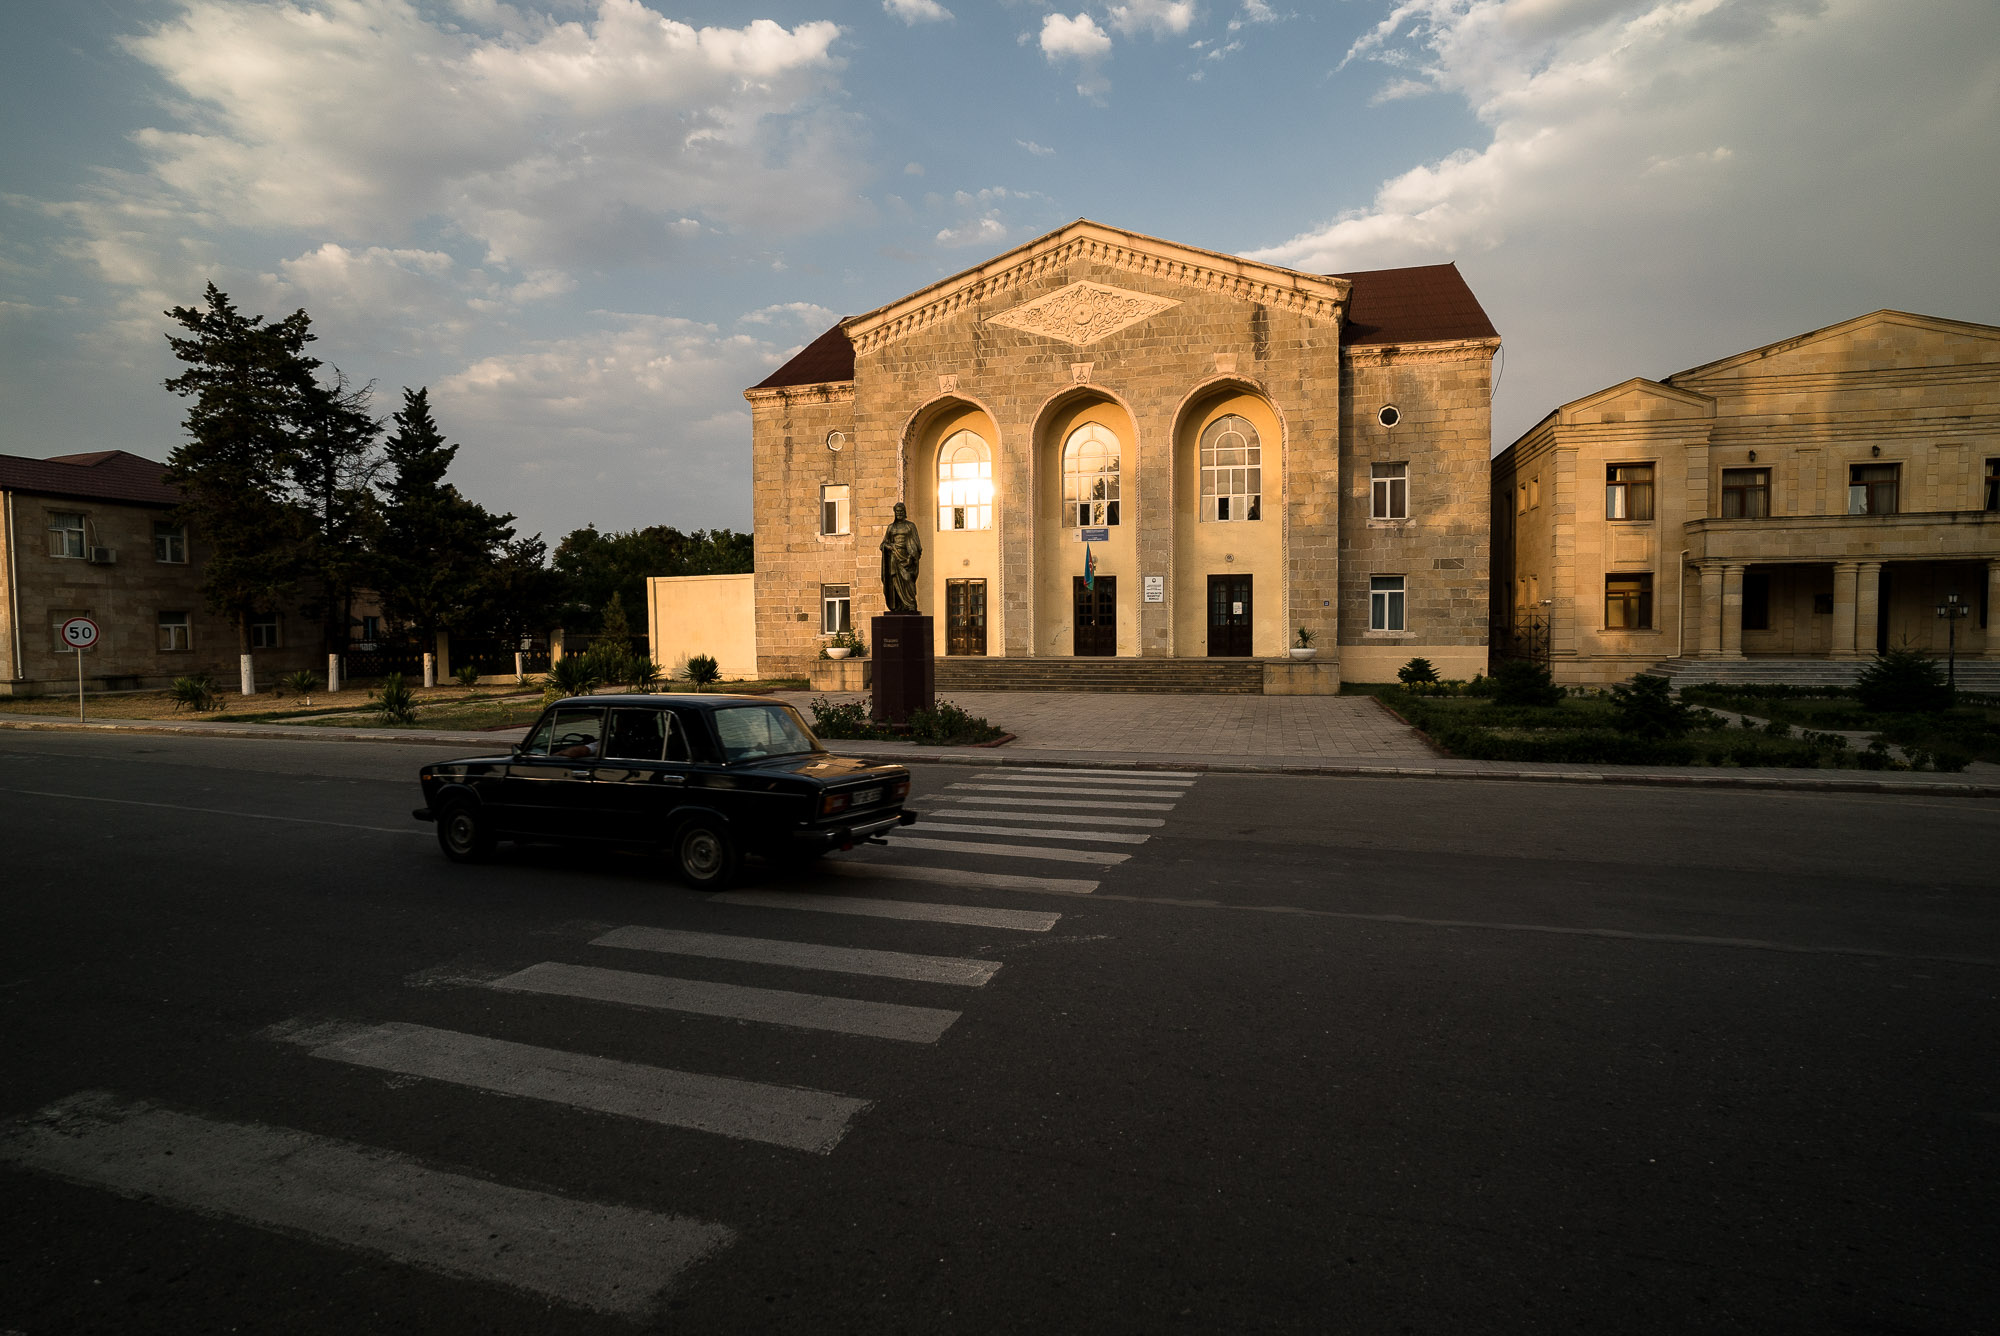 Astara in Azerbaijan